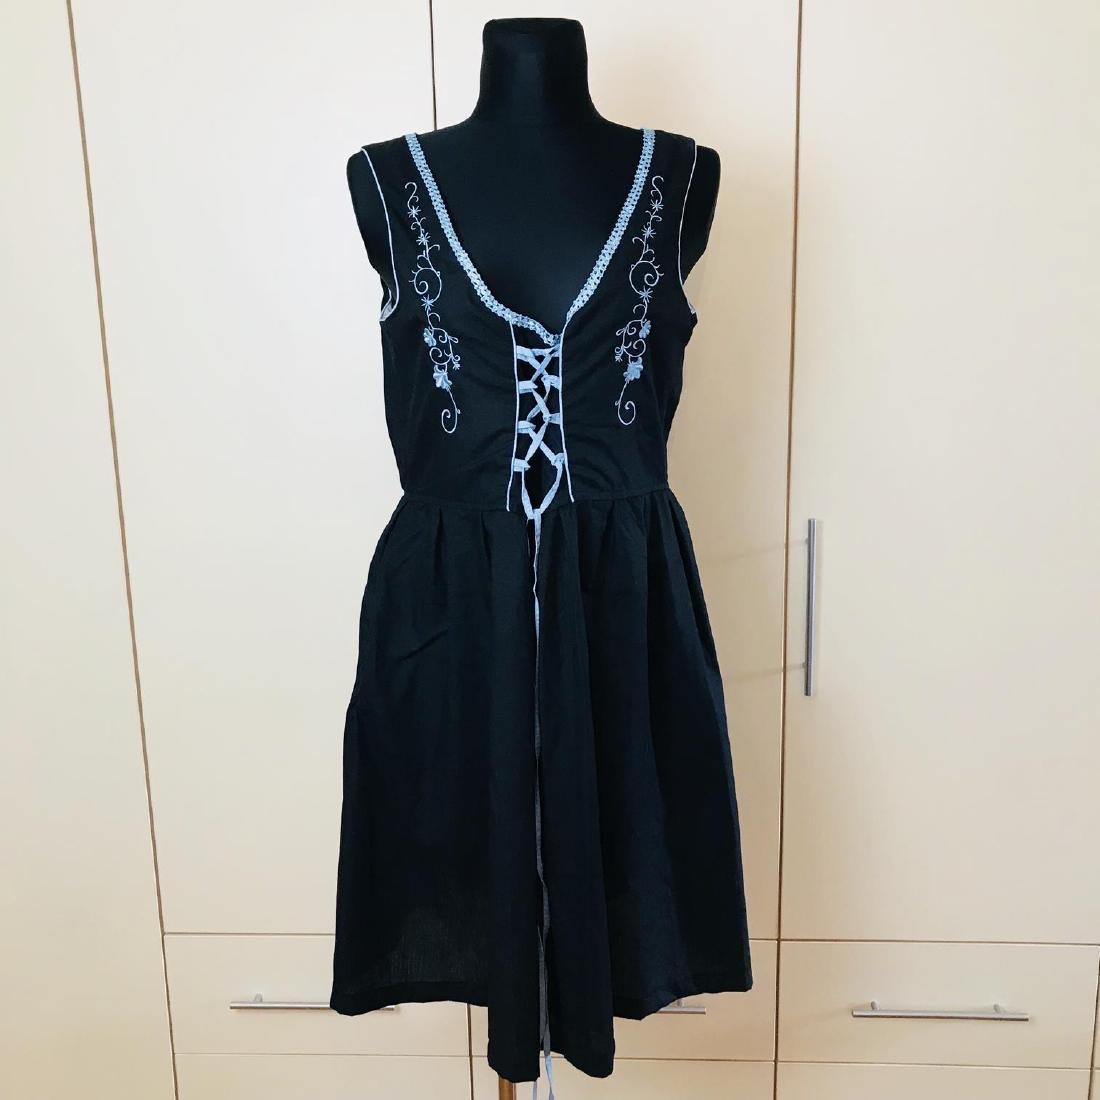 Vintage Women's Black Tyrolean Drindl Dress Size US 16